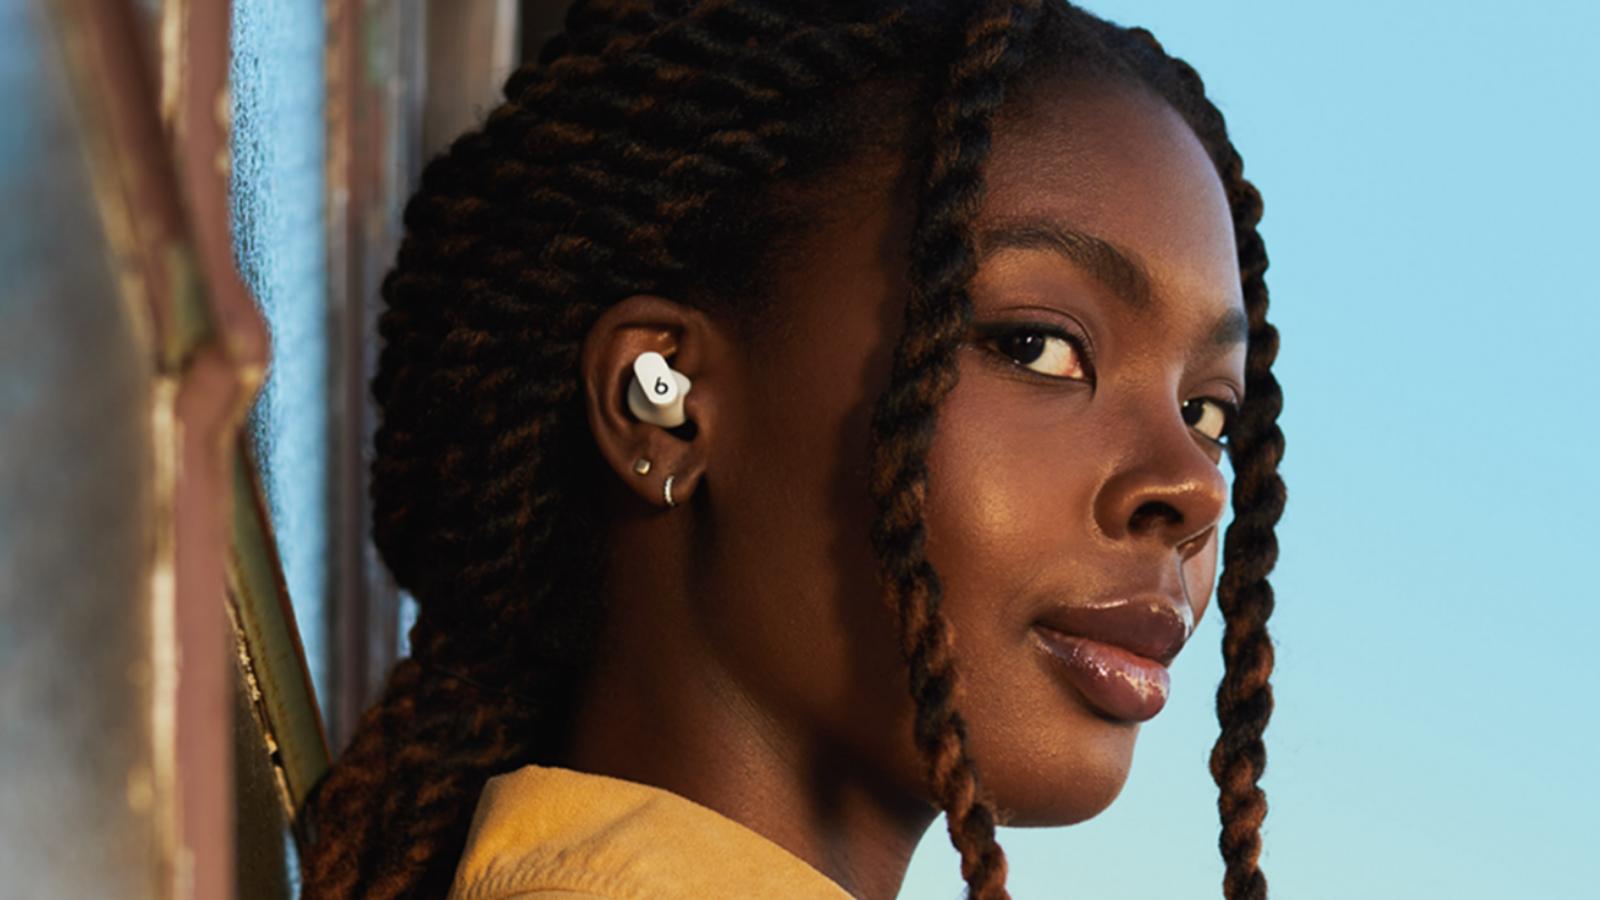 closeup of woman wearing Beats by Dre's Studio Buds